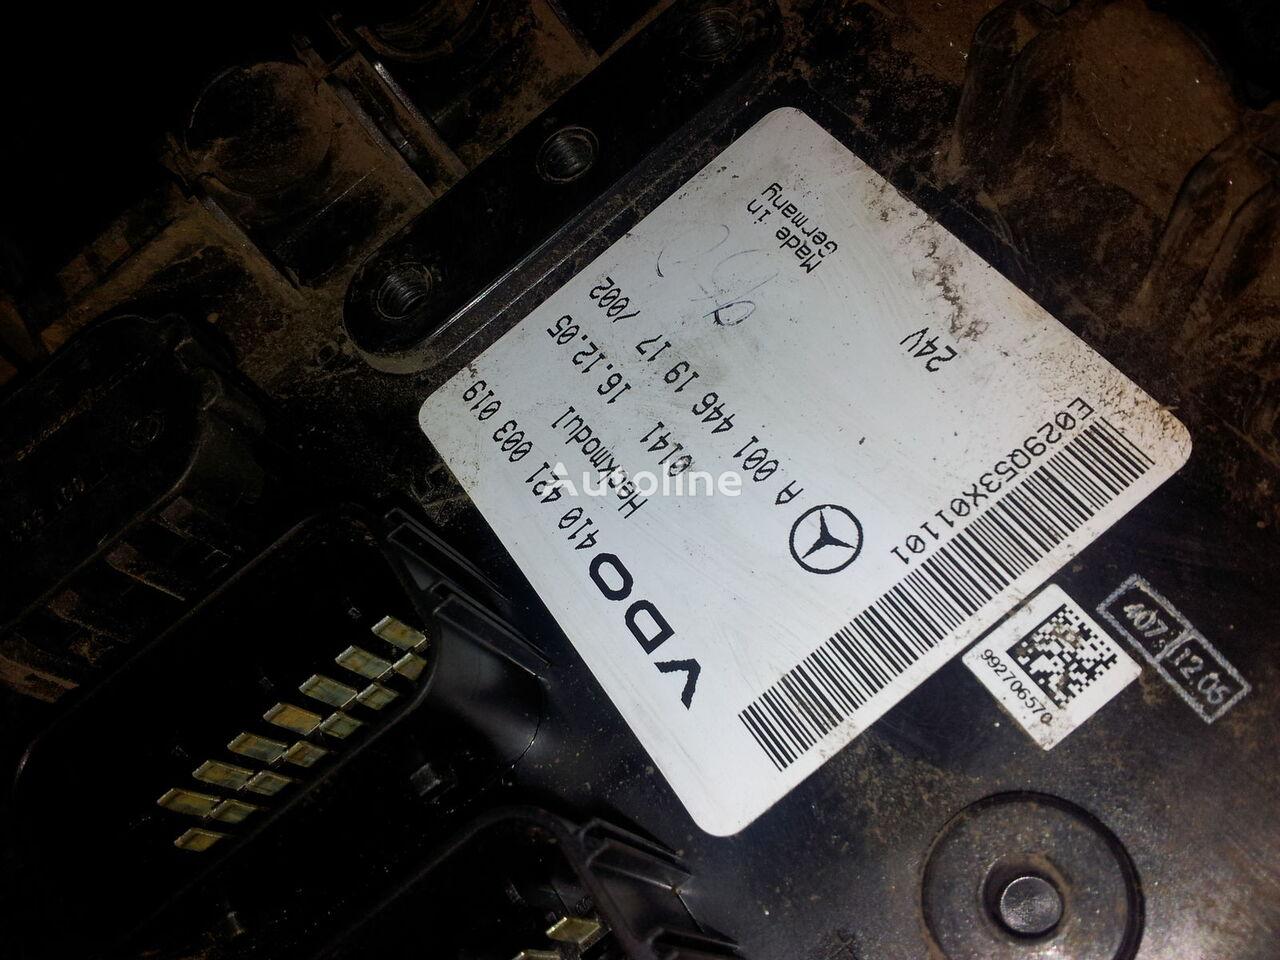 MB Actros MP2, MP3, Heckmodul, control unit, EDC, ECU, rear module electronics, 0014461917, 0014462817, 0014462017,0014461917,0014462717,0014461617, 41021003020, 410421003019, 0014462817 unidad de control para MERCEDES-BENZ Actros MP2; MP3 tractora